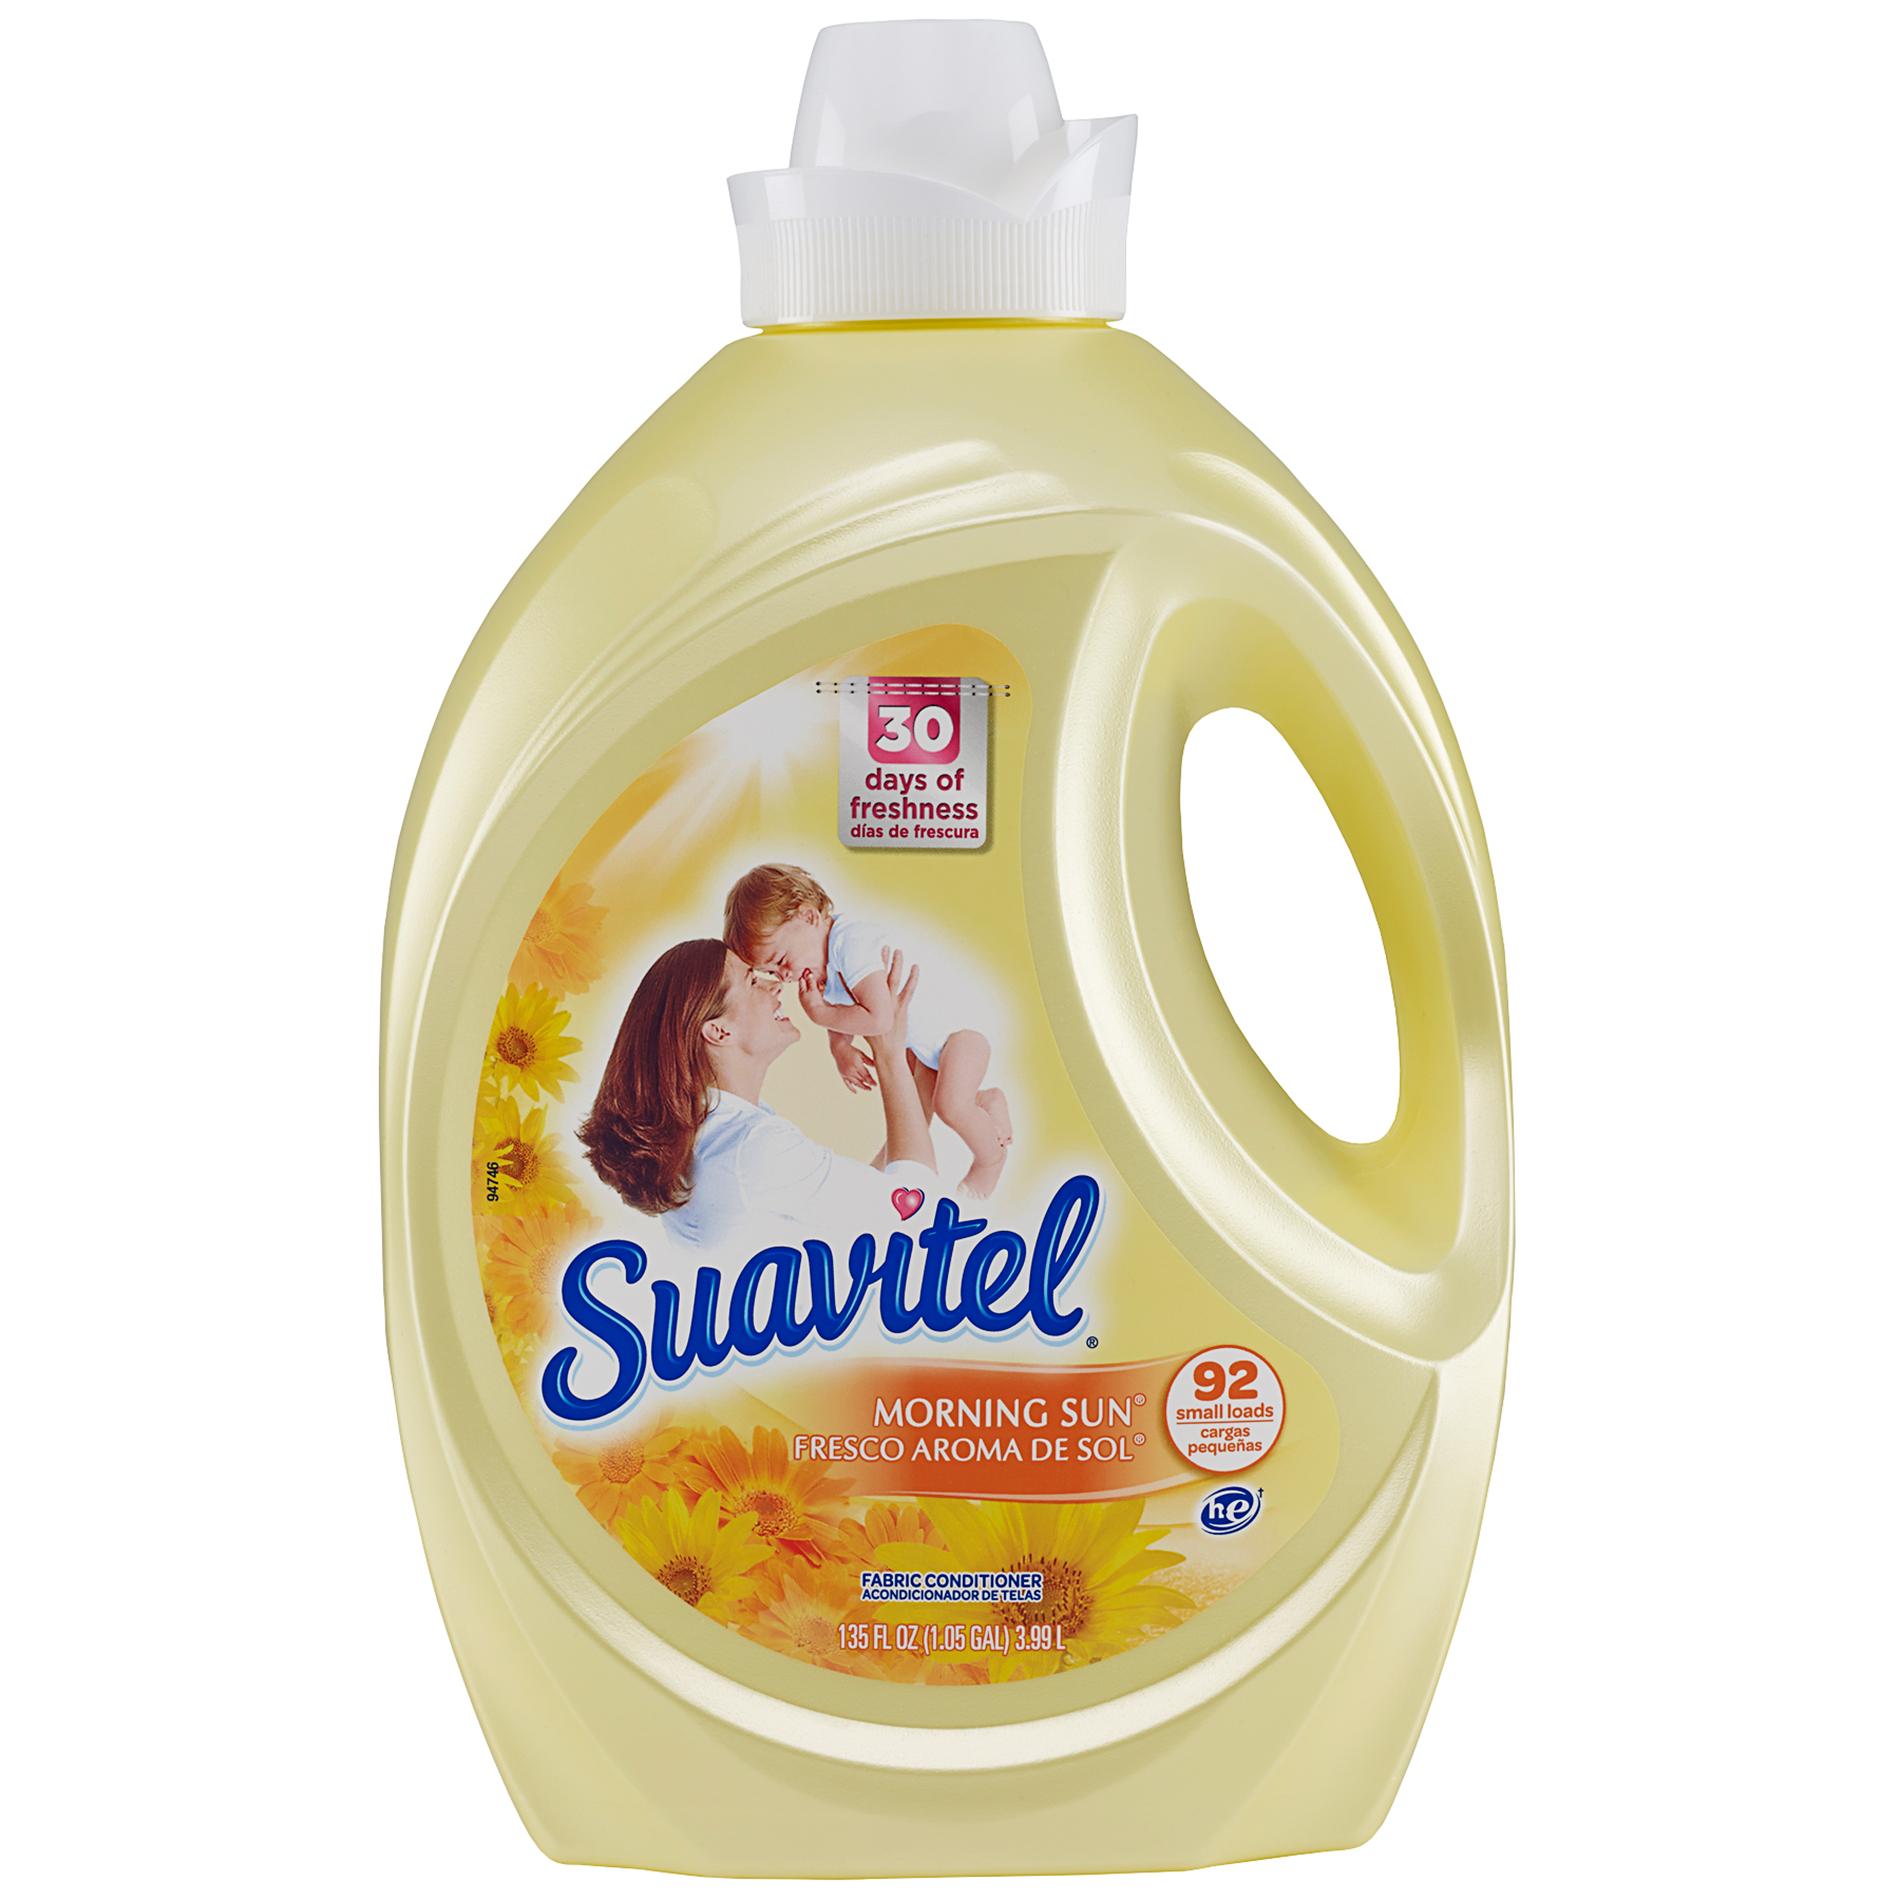 Suavitel Morning Sun, 135 fluid ounce im test